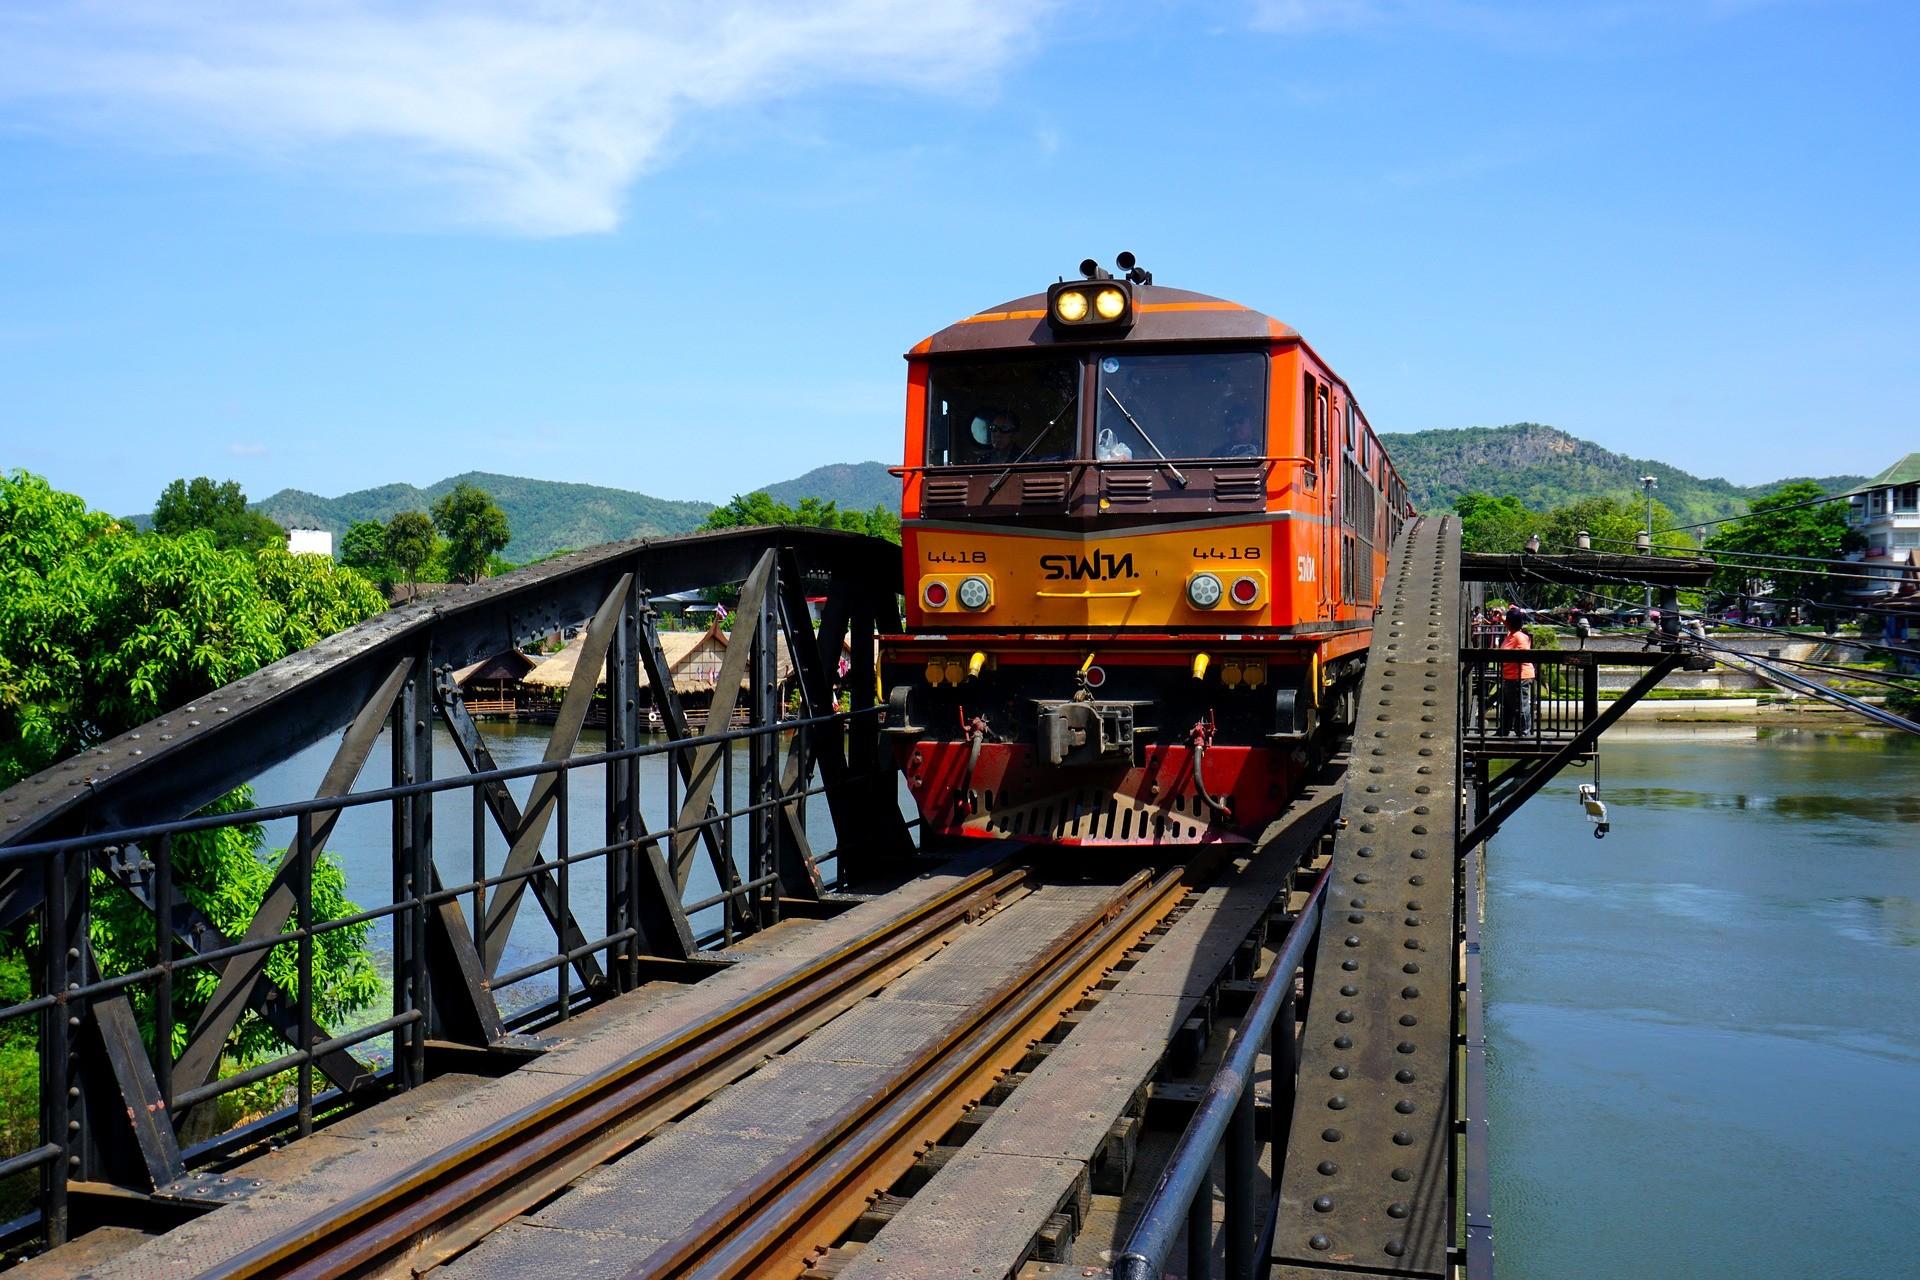 Brug over de rivier Kwai | Kanchanaburi